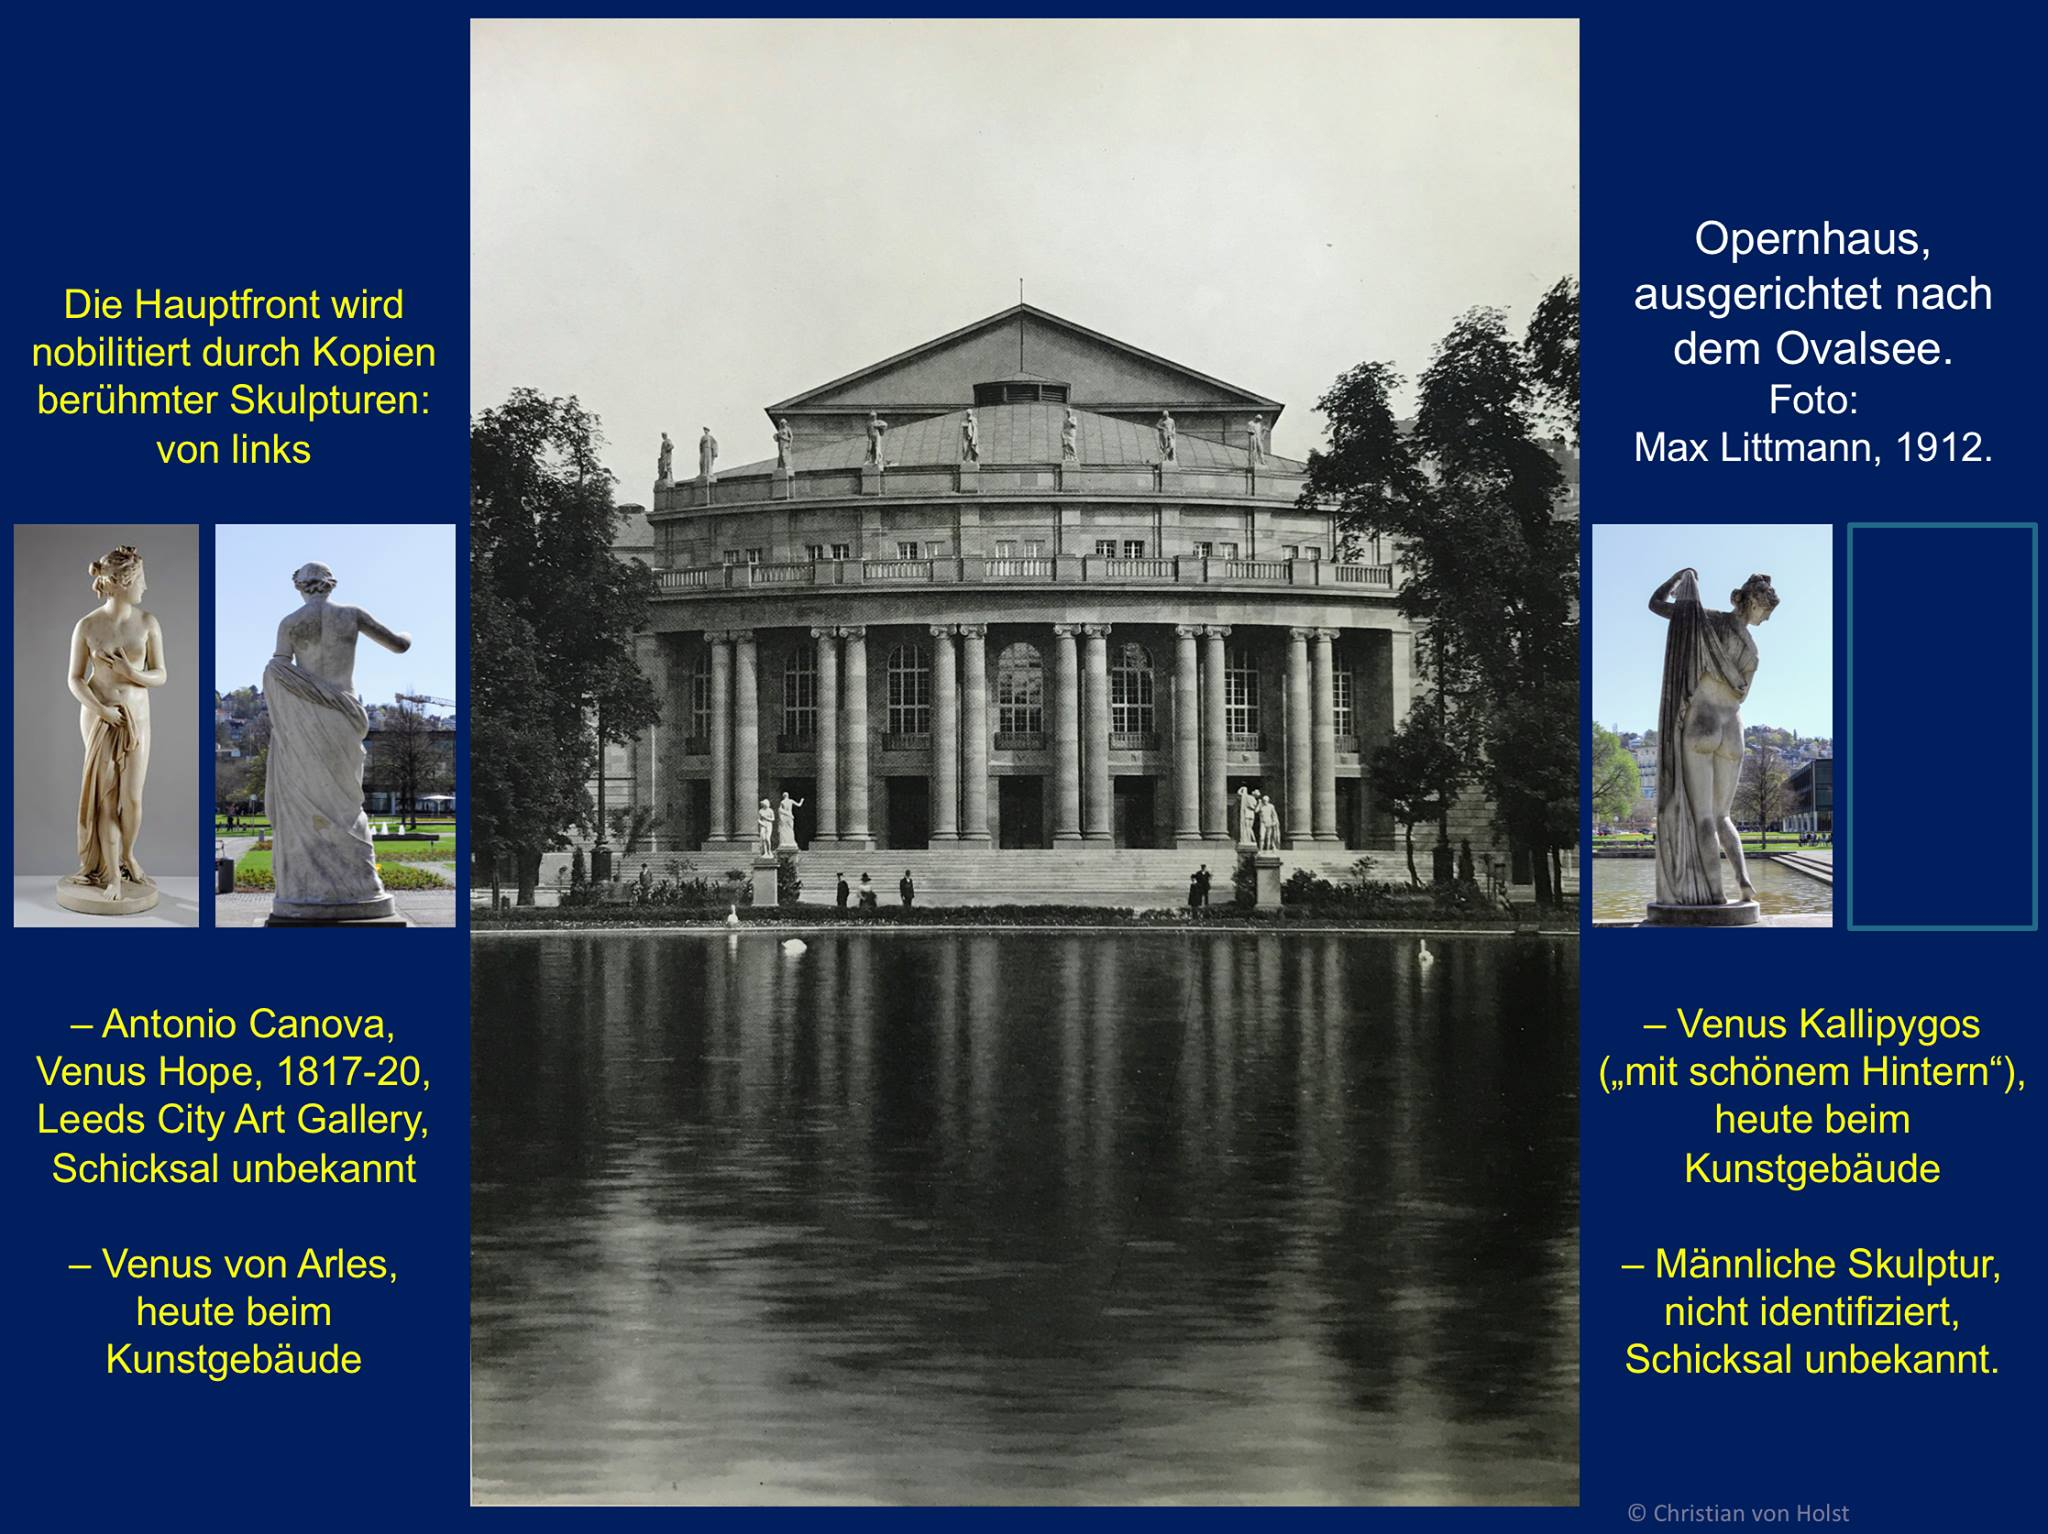 Opernhaus Gartenfront 1912